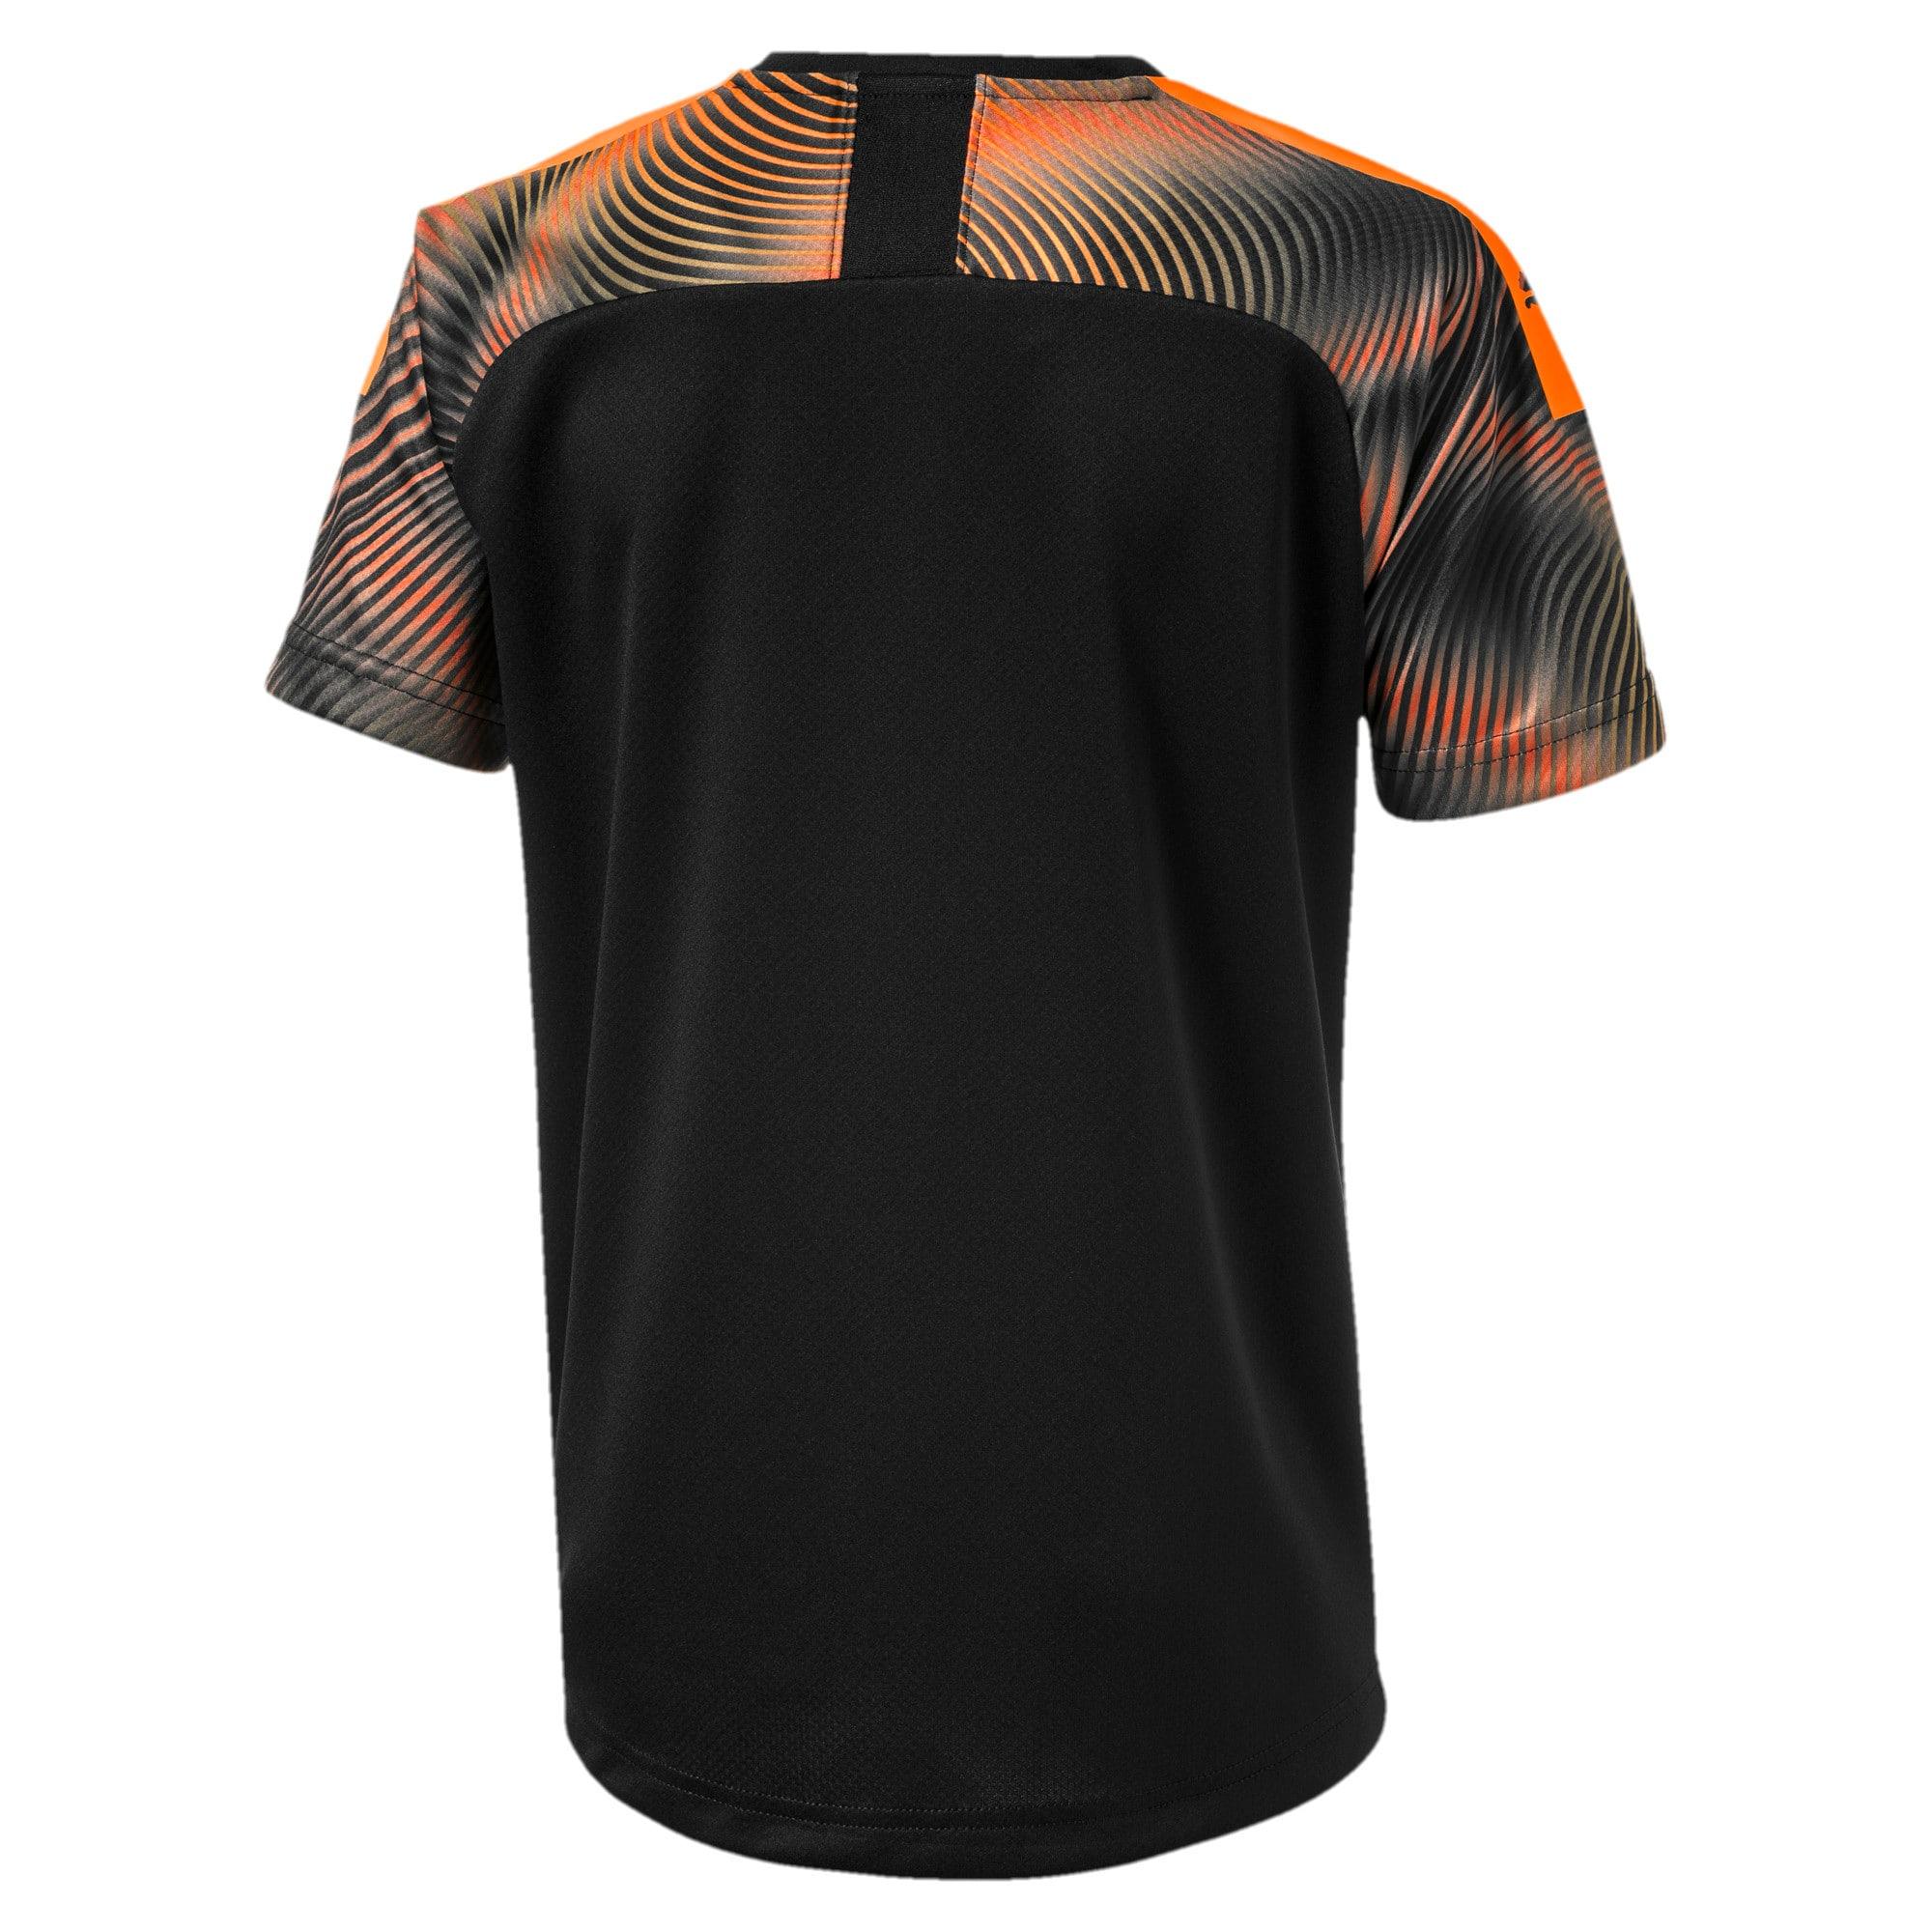 Thumbnail 2 of Valencia CF Away Replica Boys' Shirt, Puma Black-Vibrant Orange, medium